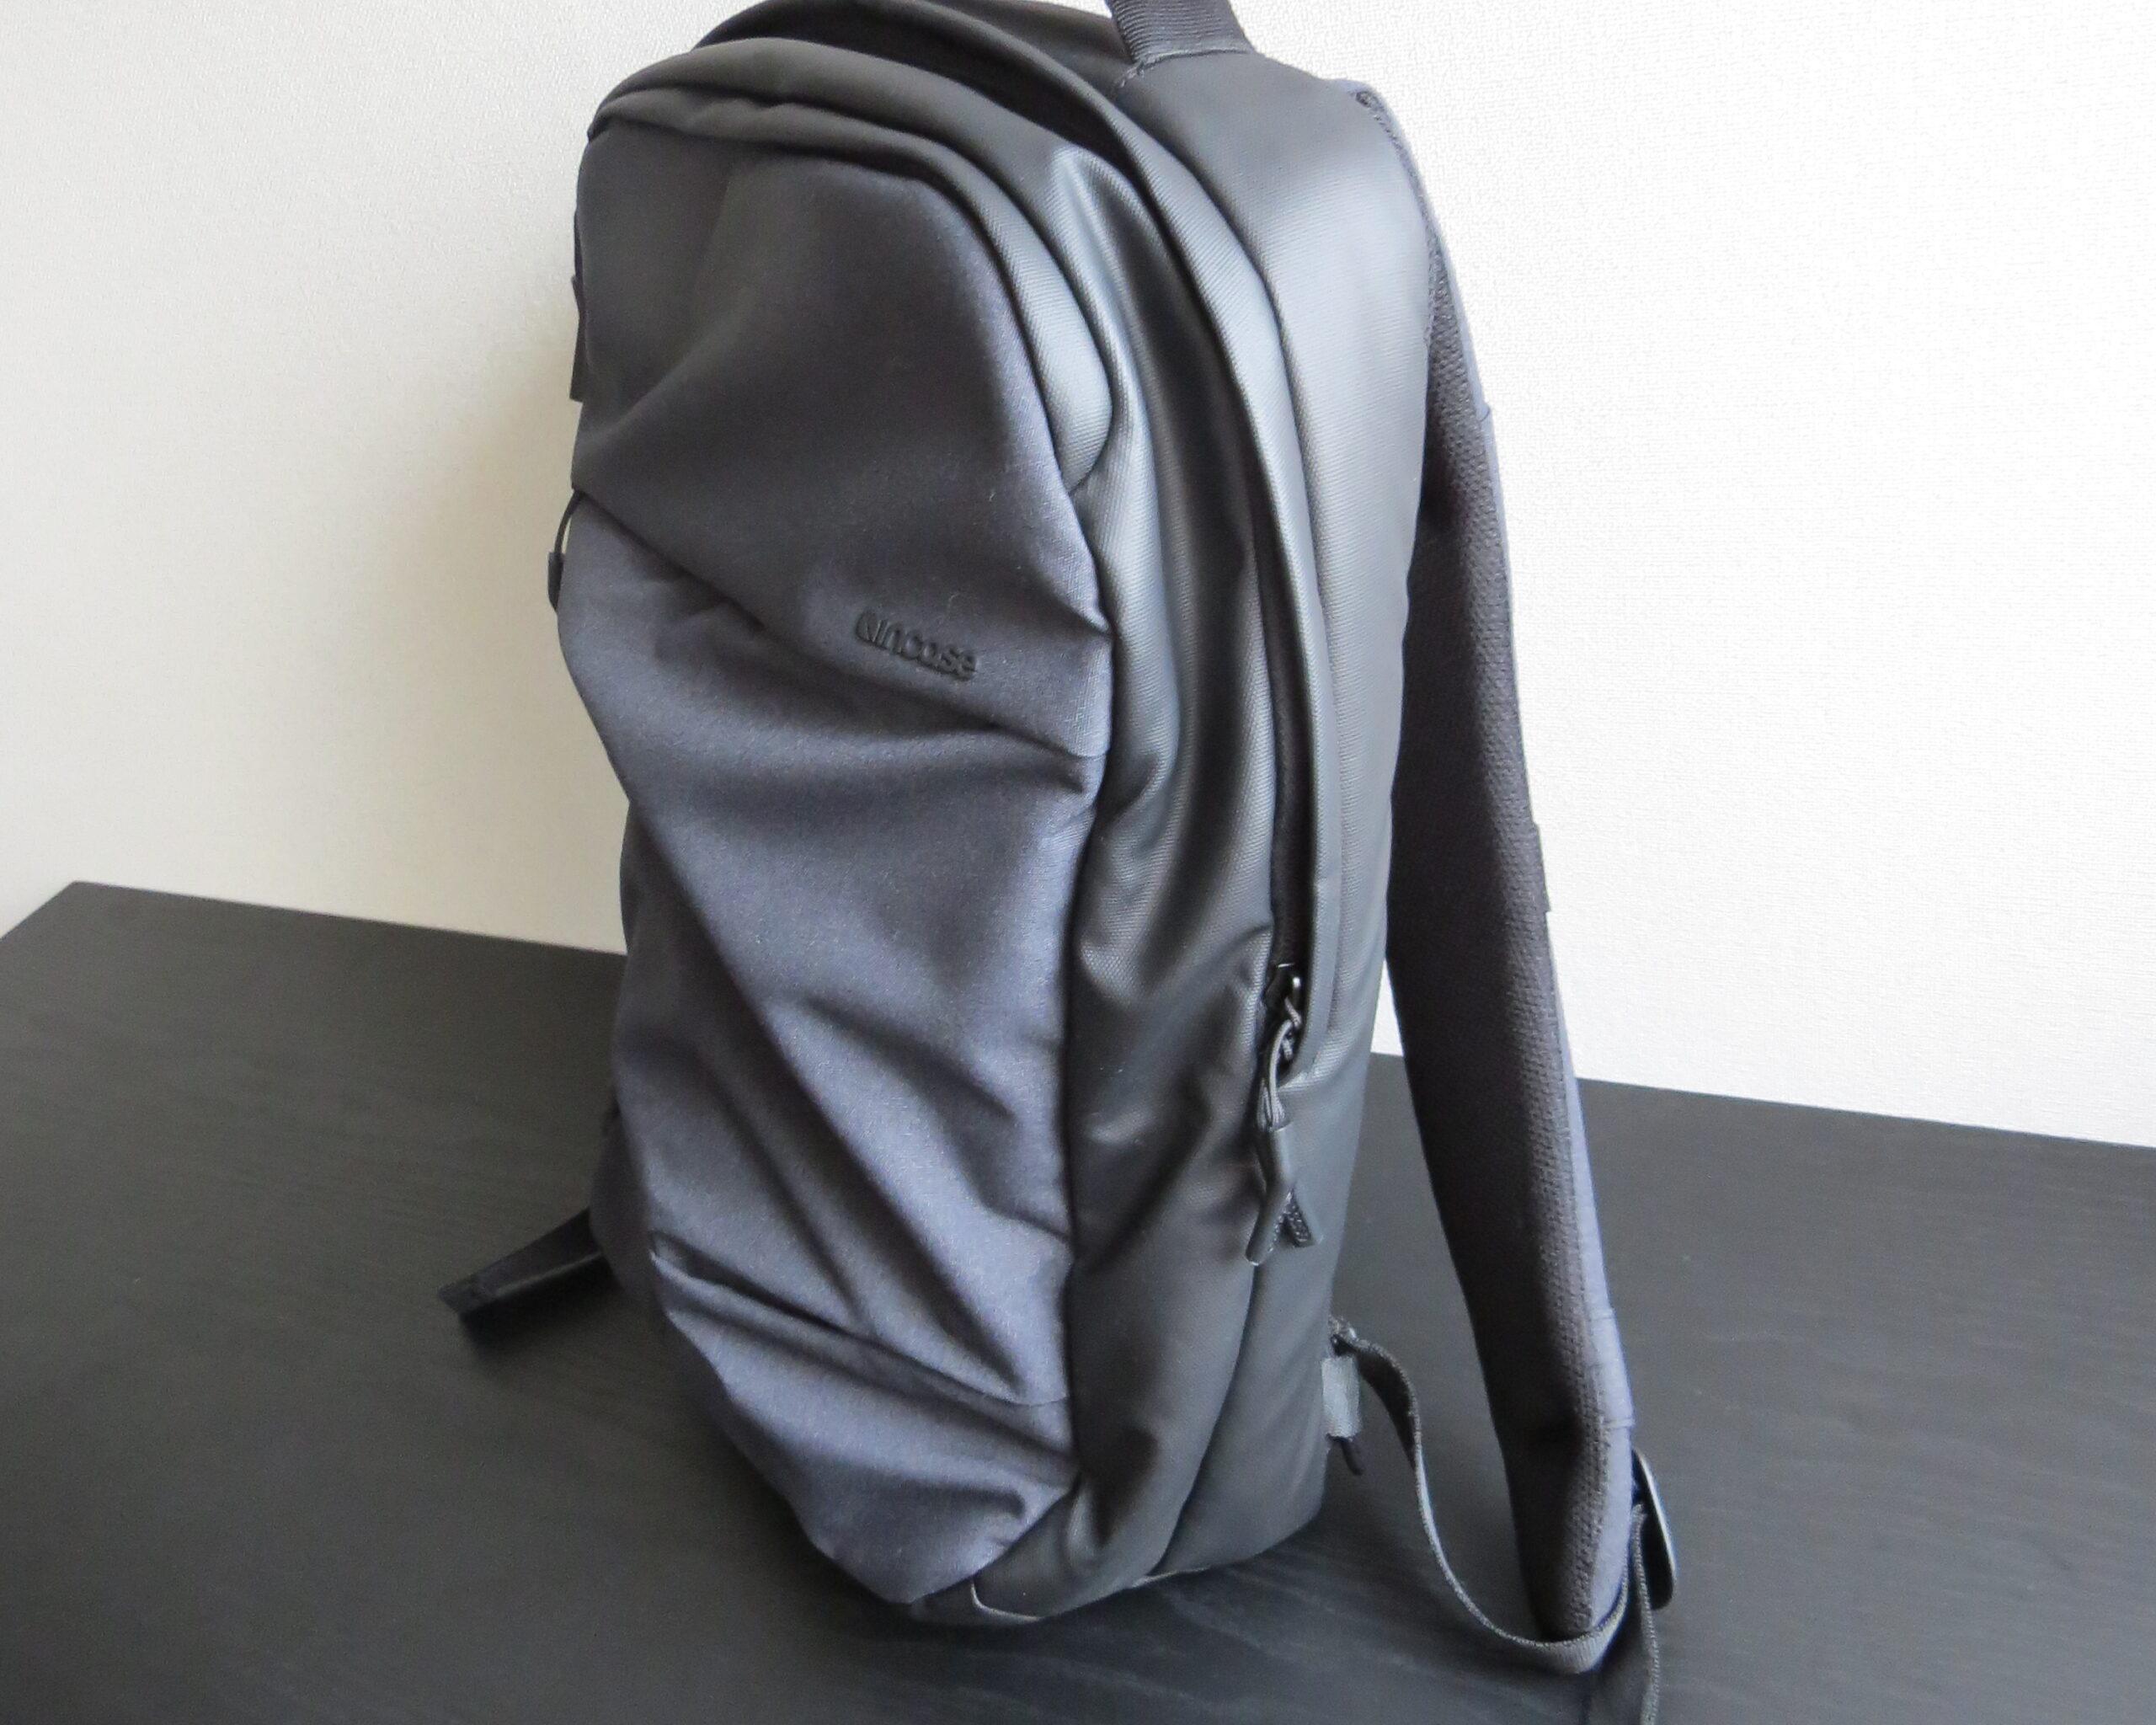 city collection compact backpackに荷物を入れてみた